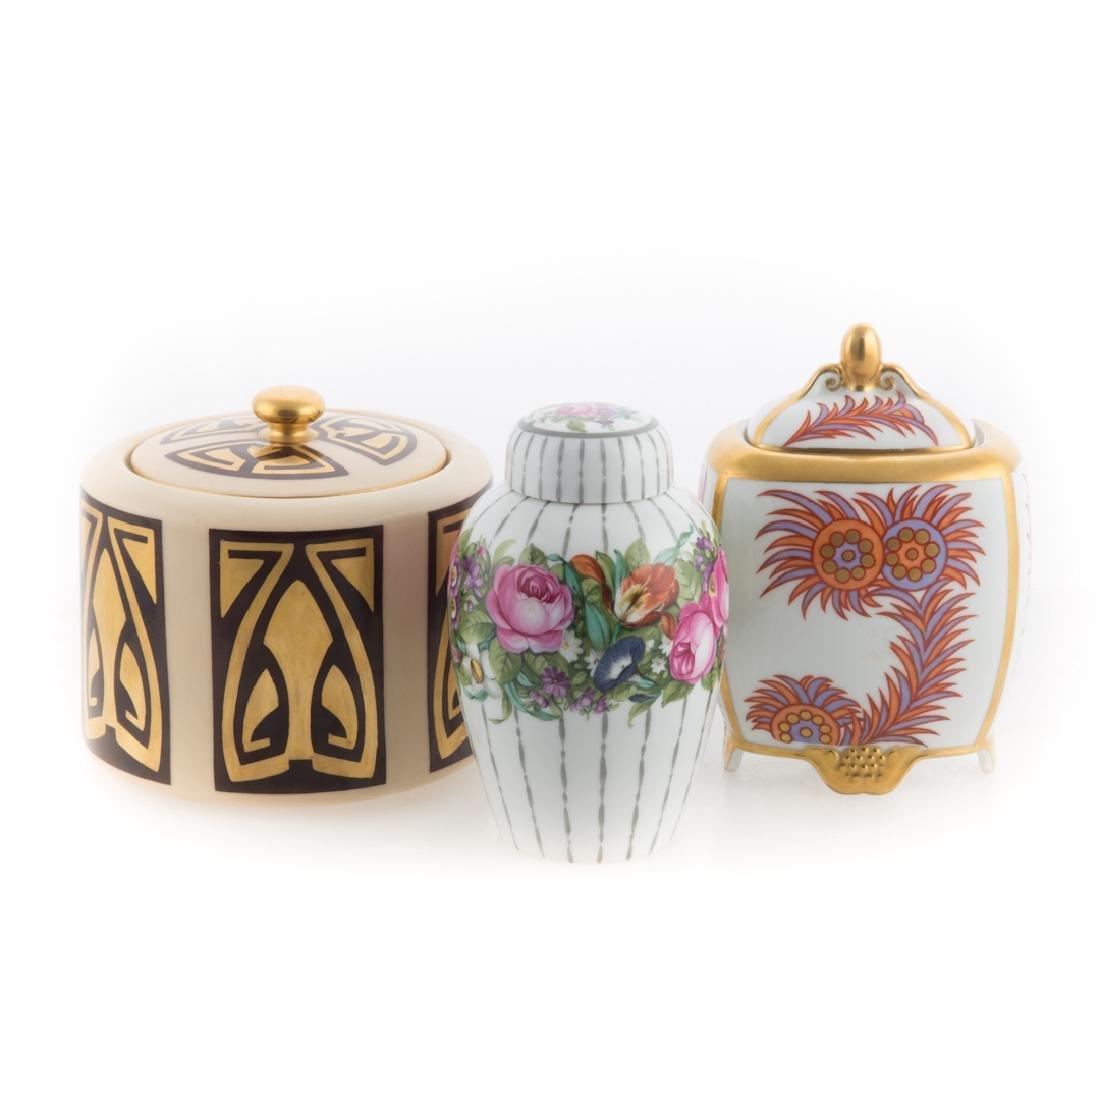 Three German and Austrian porcelain jars